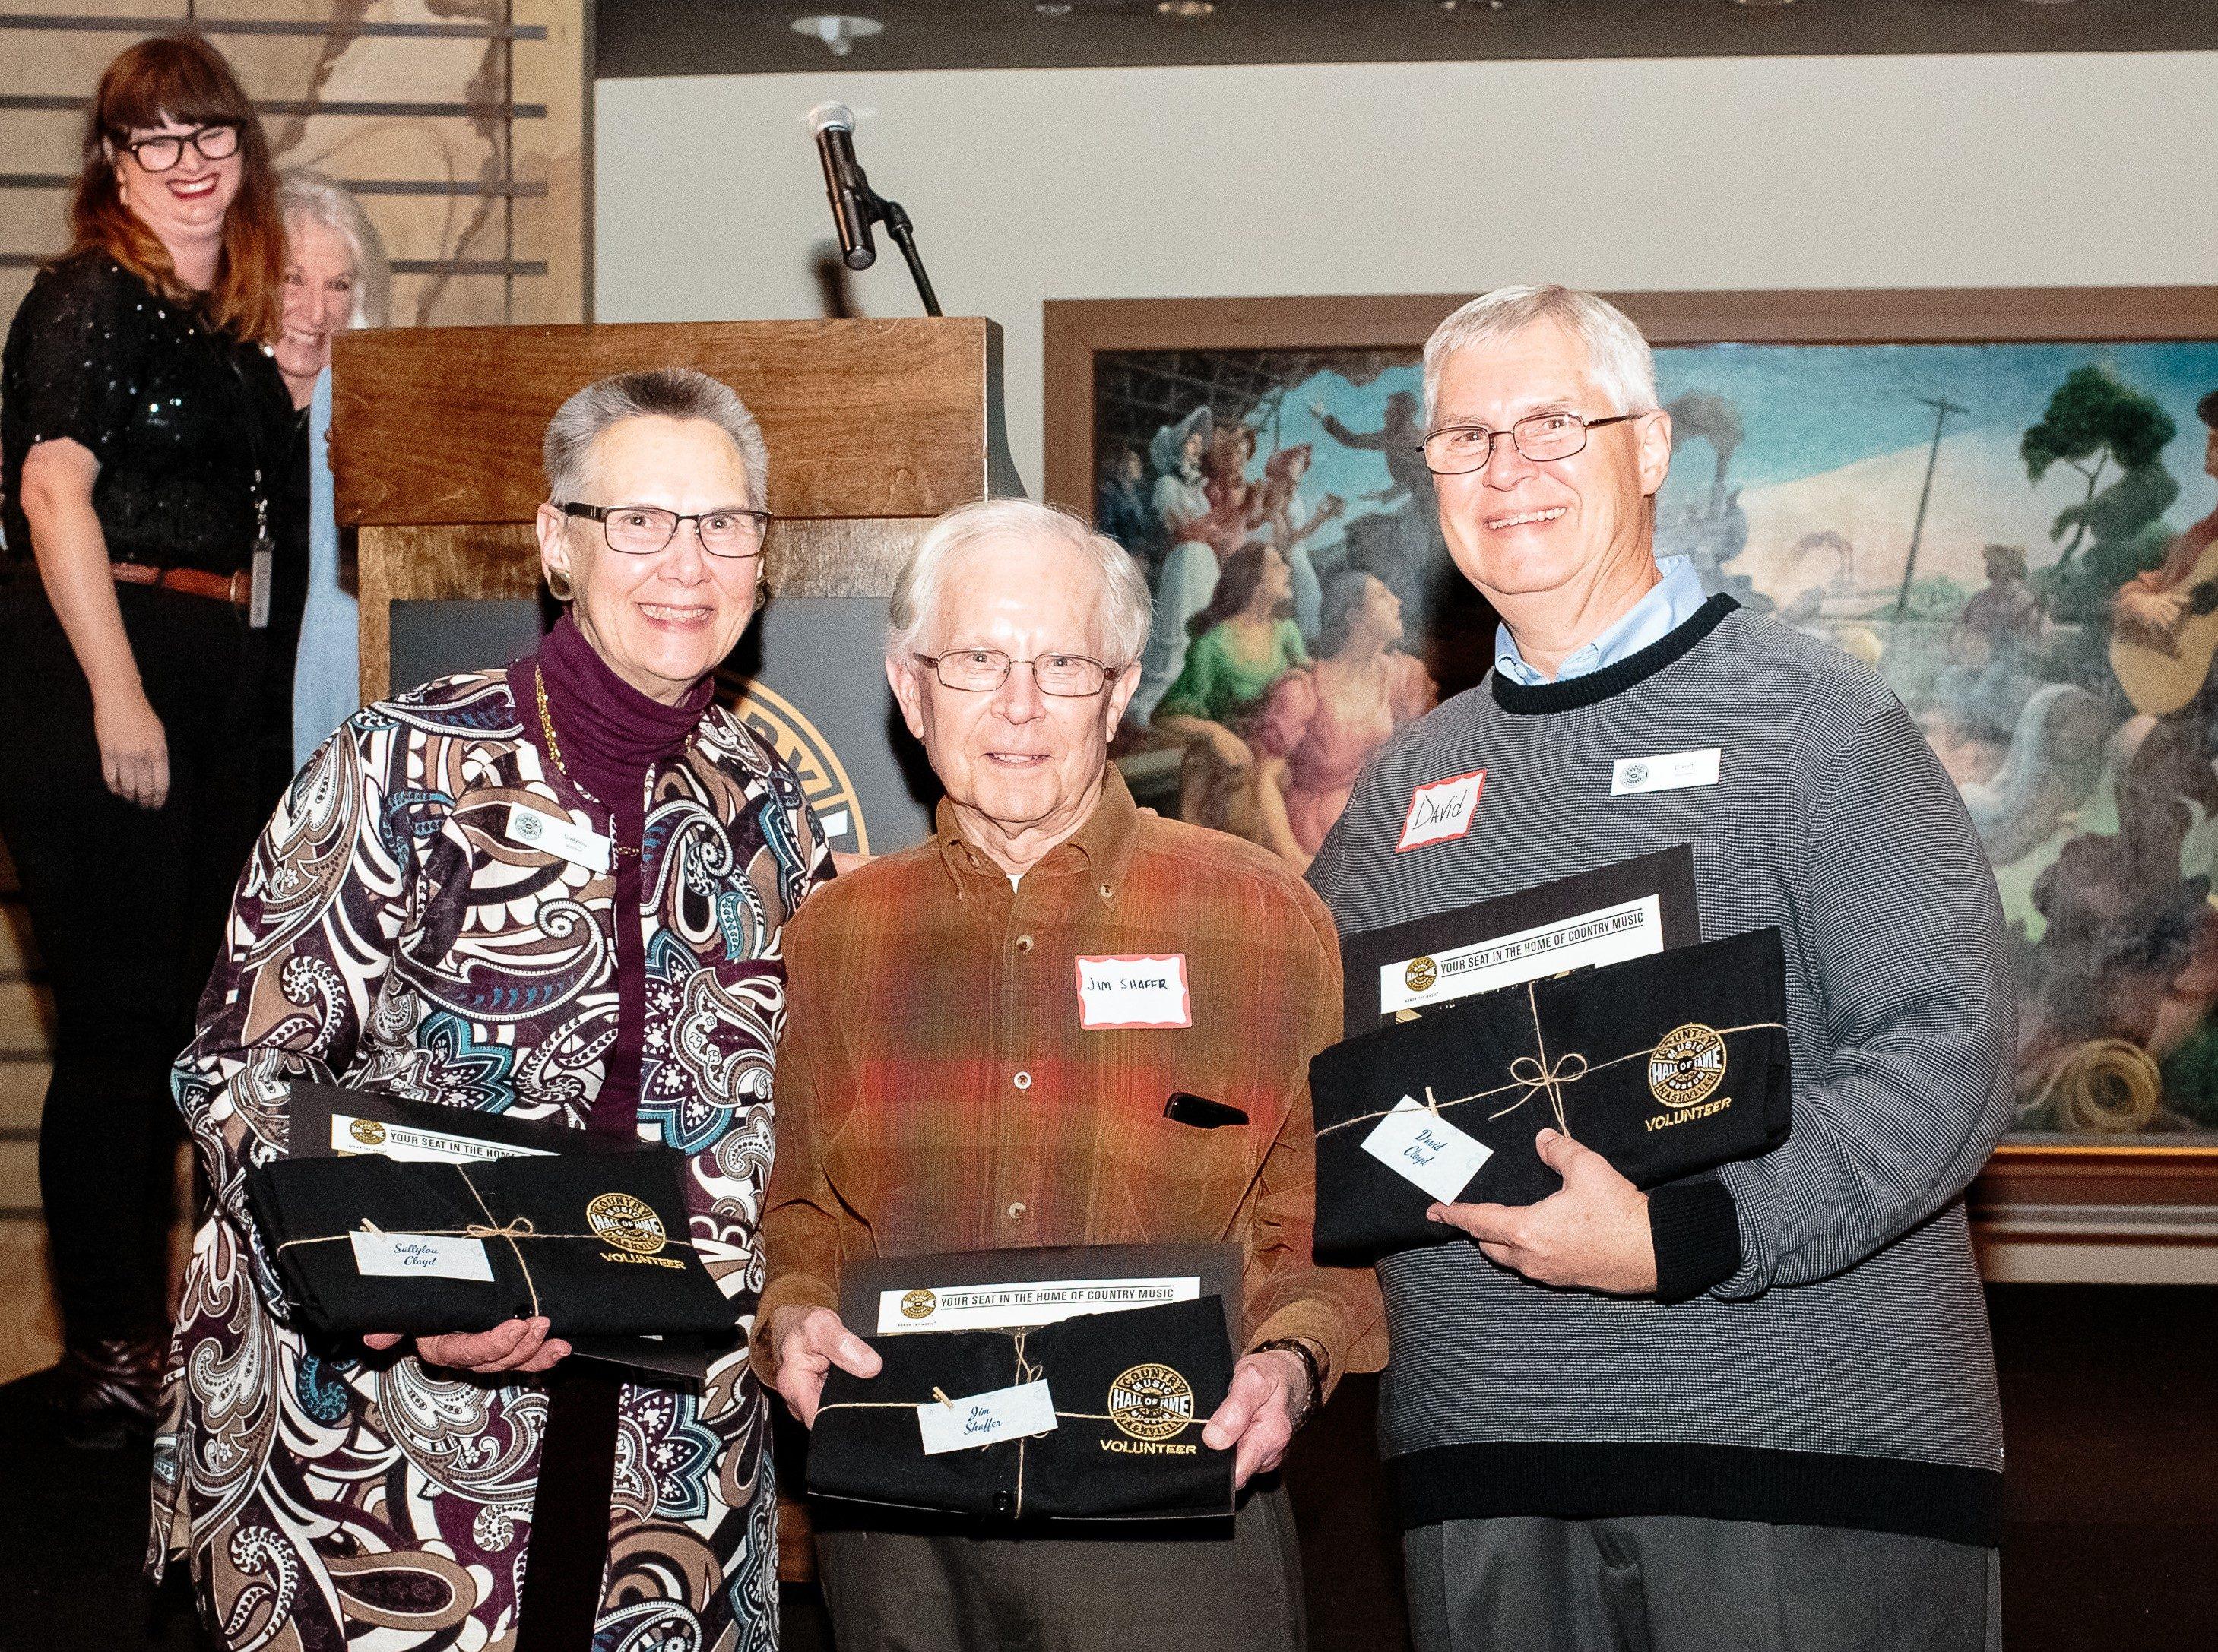 Volunteers Dani Carol, Sallylou Cloyd, Jim Shaffer, David Cloyd pose for photo at Volunteer awards ceremony